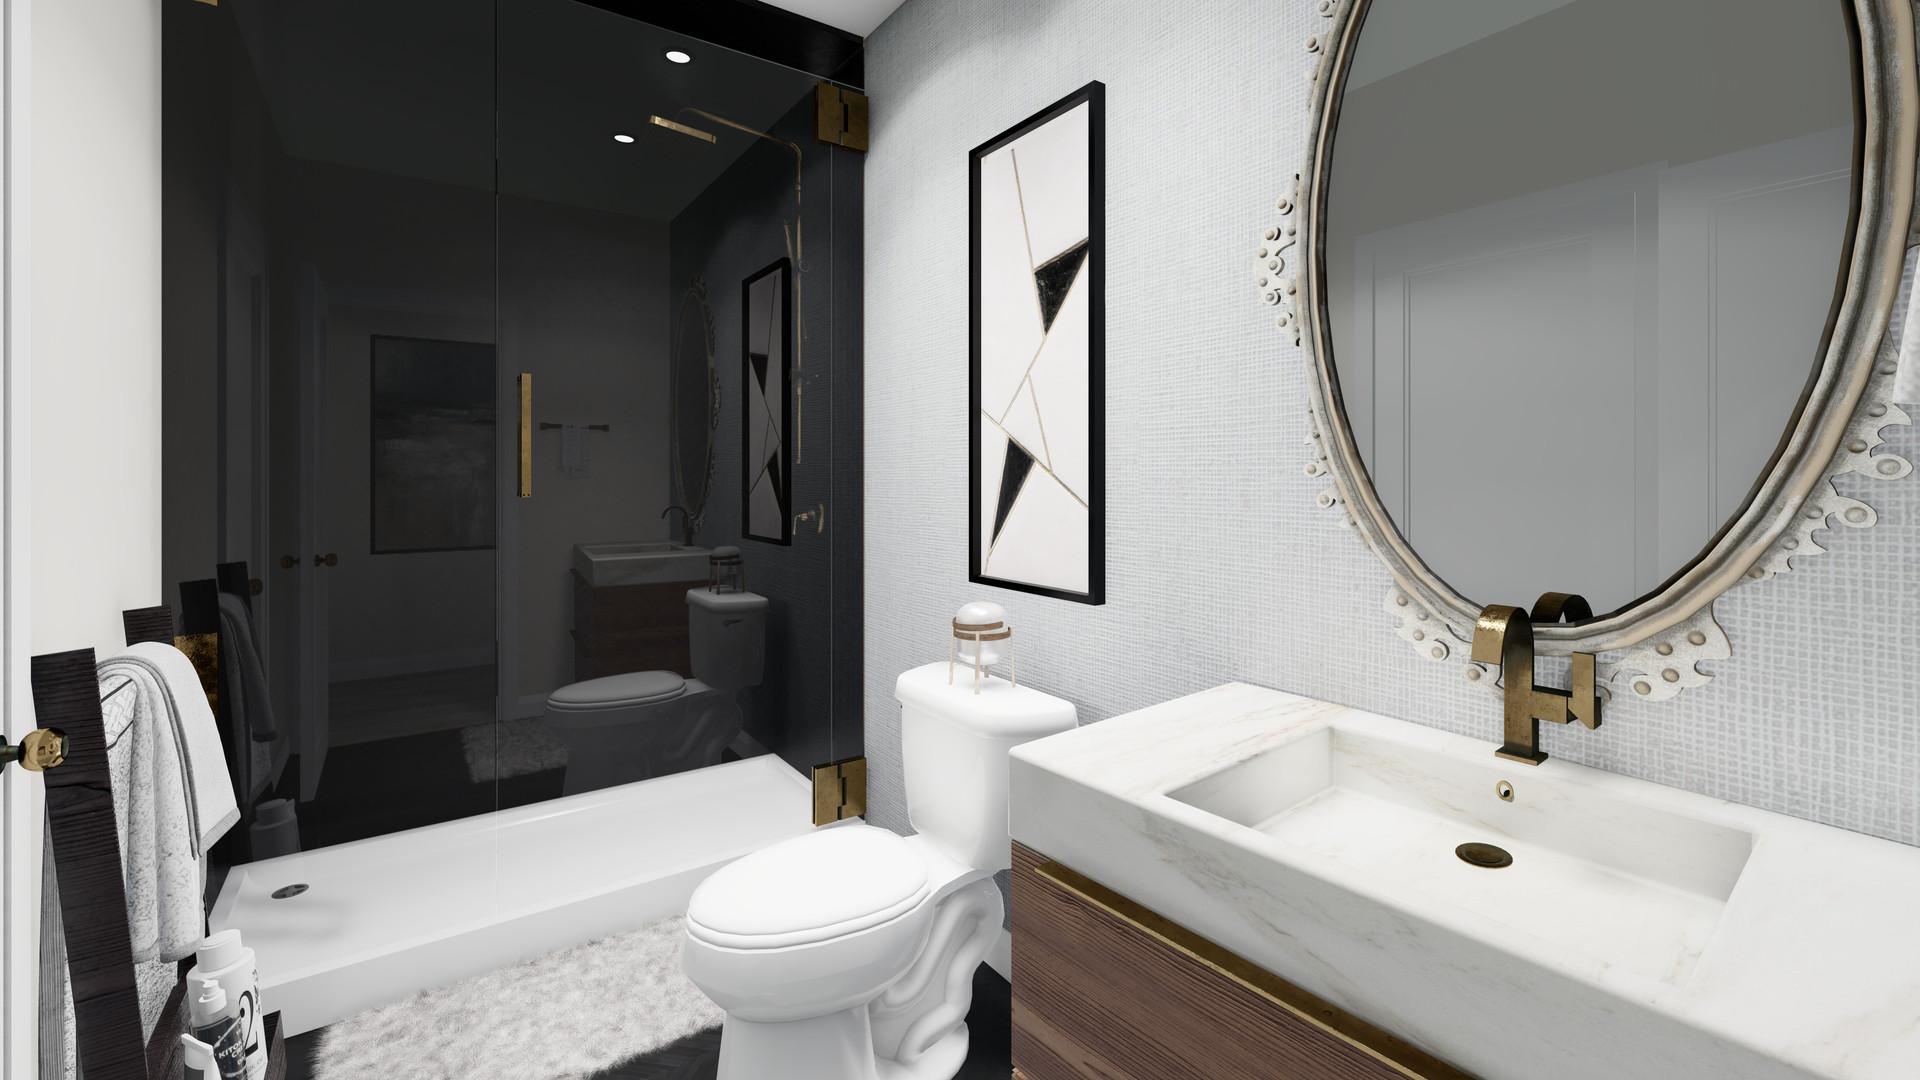 Goldenn_Shared Washroom.jpg